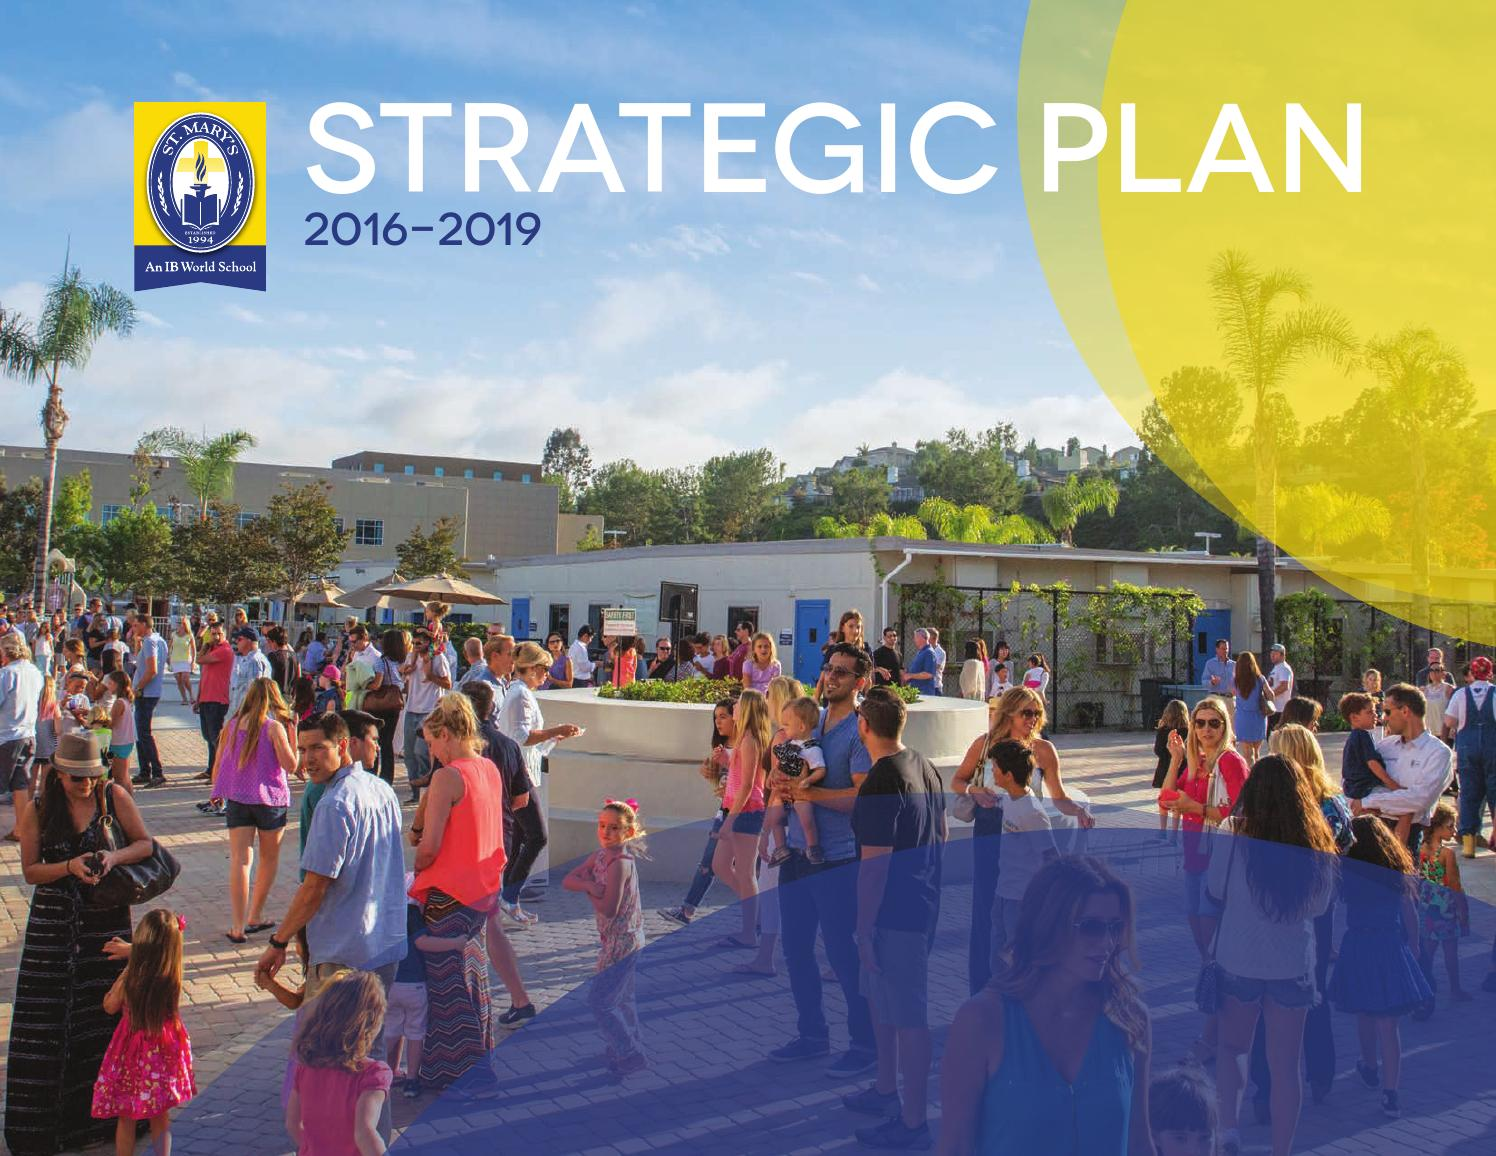 Strategic Plan 2016-2019 by St. Mary's School - Issuu